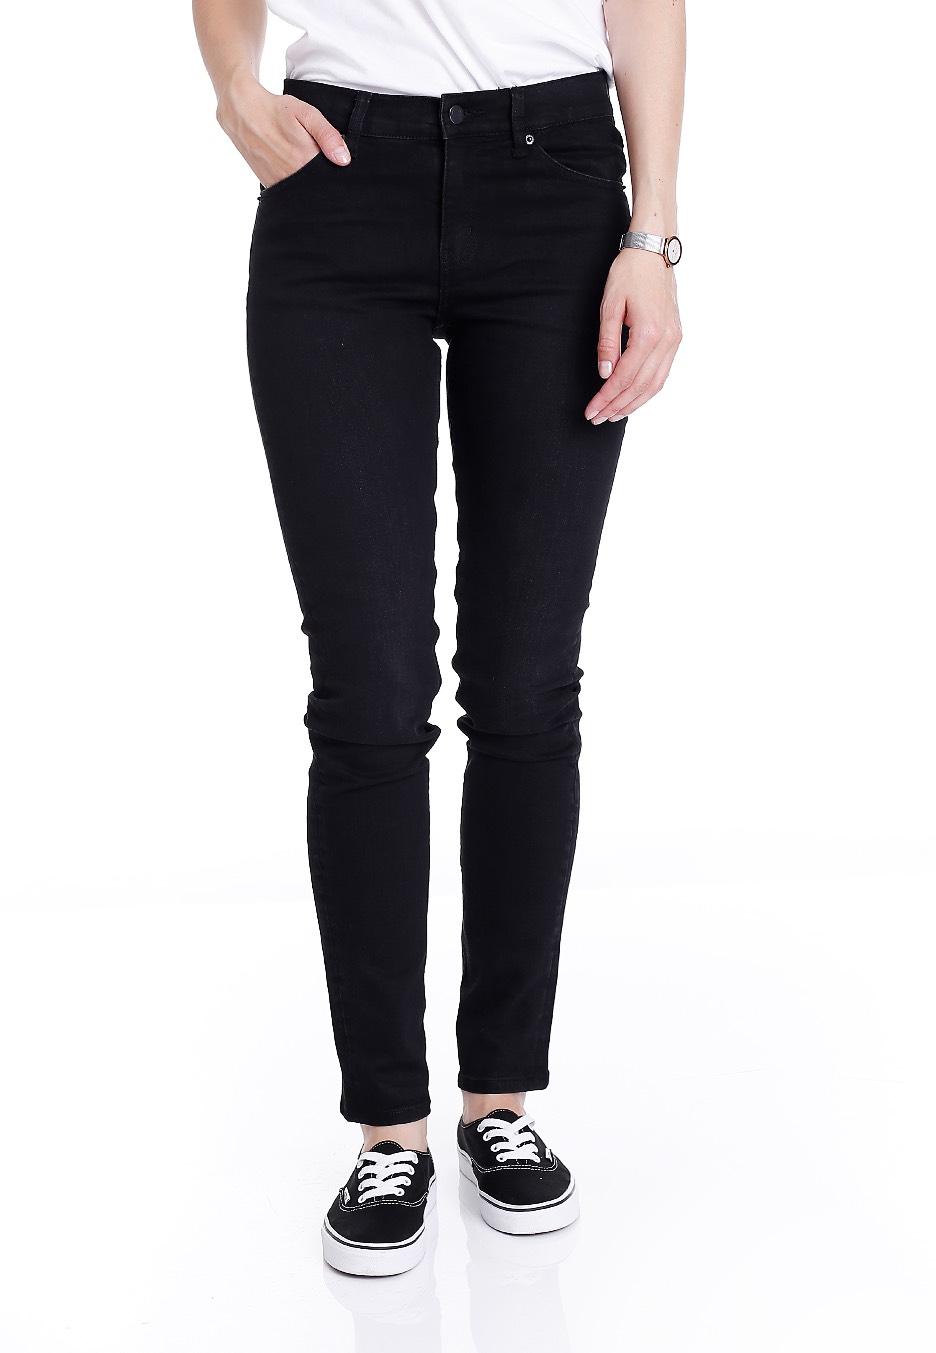 cheap monday tight black haze jeans de. Black Bedroom Furniture Sets. Home Design Ideas